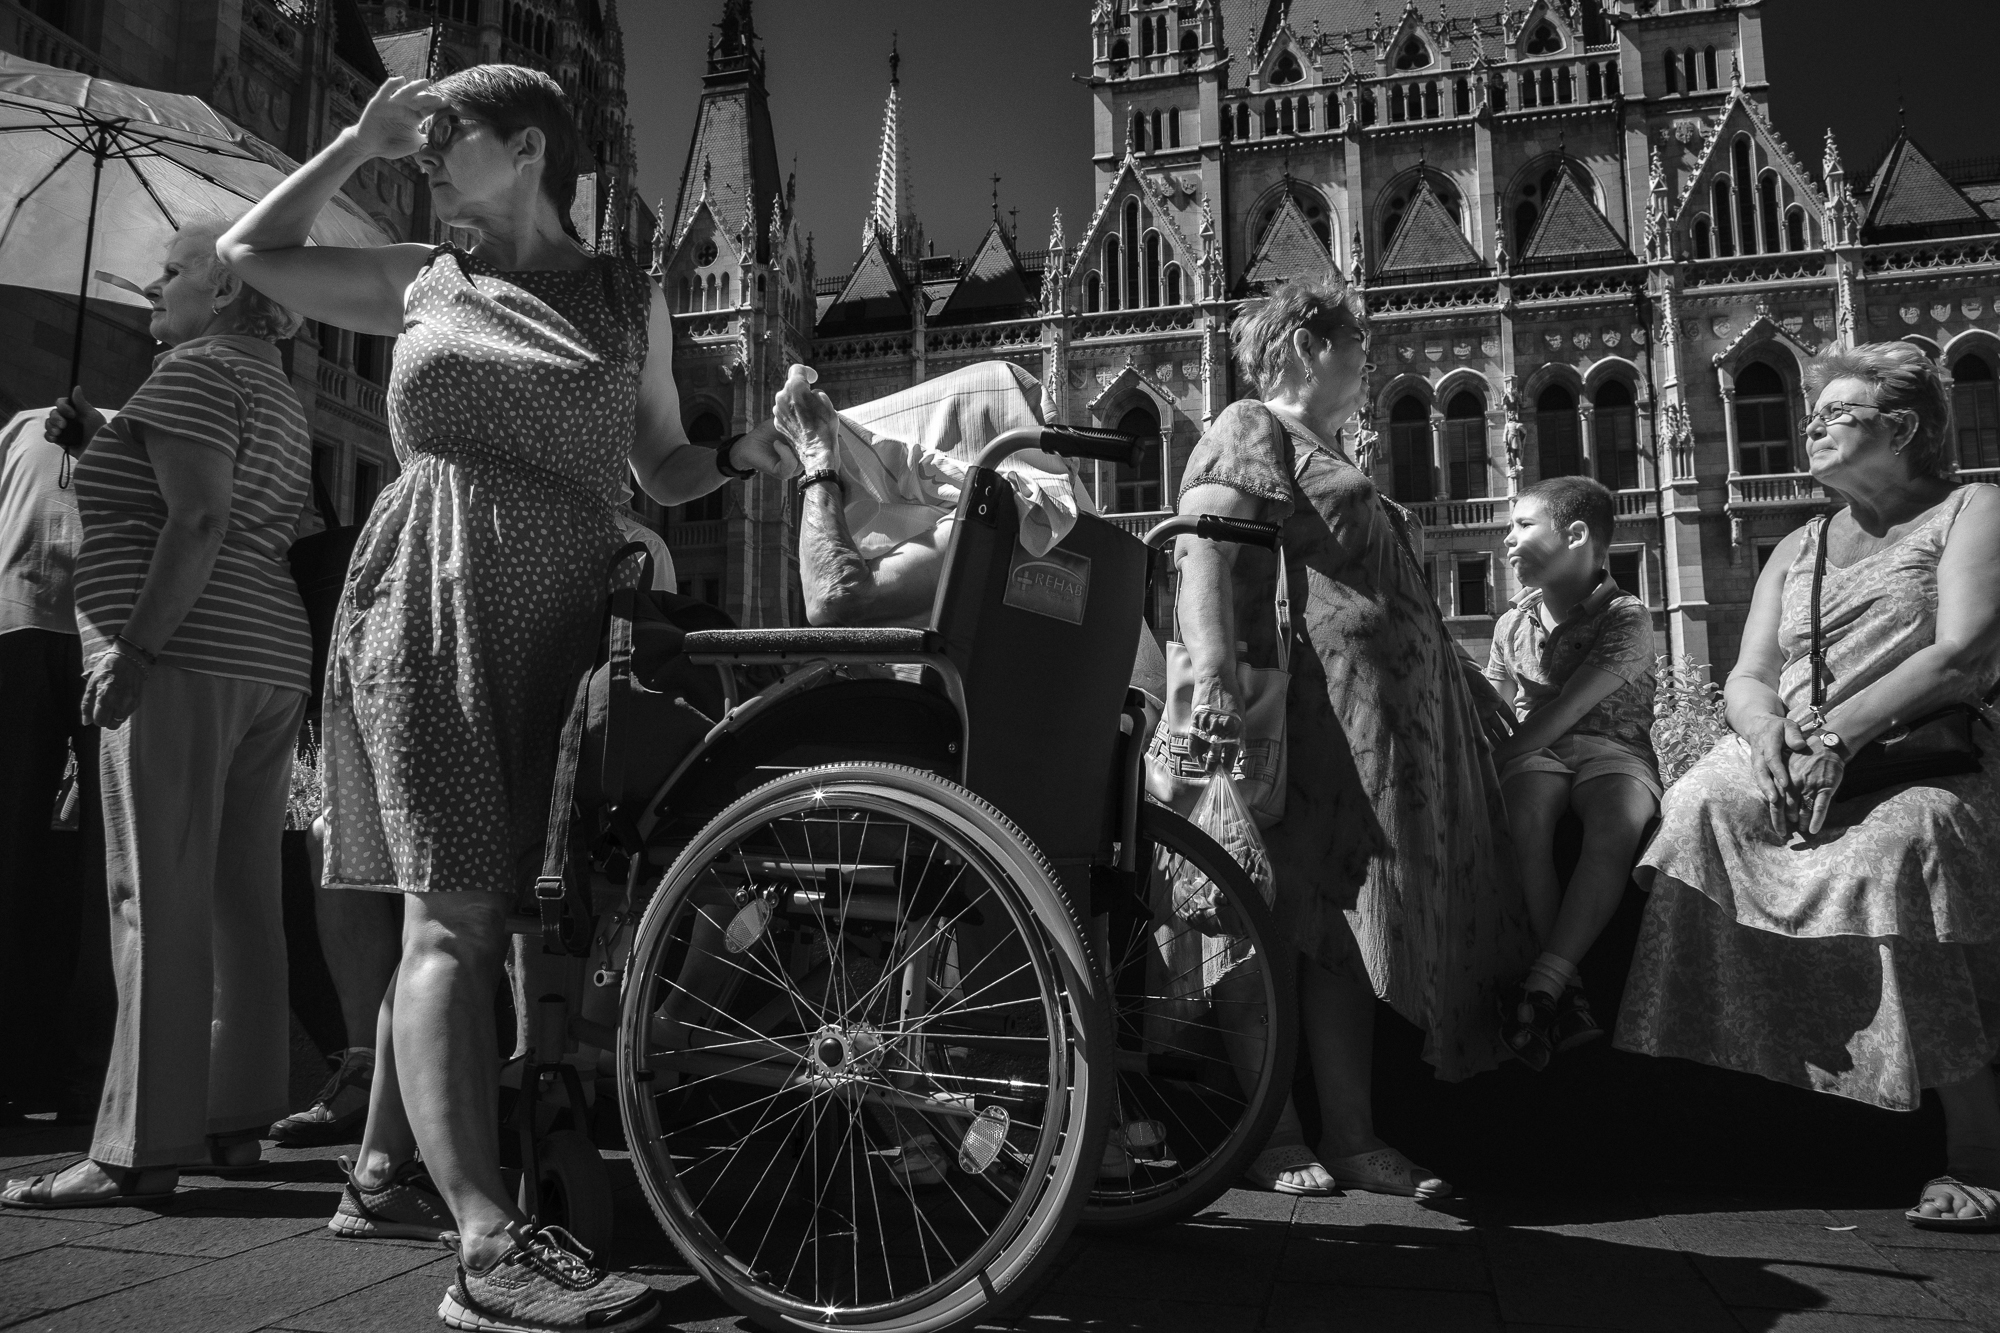 Wheelchair in Queue